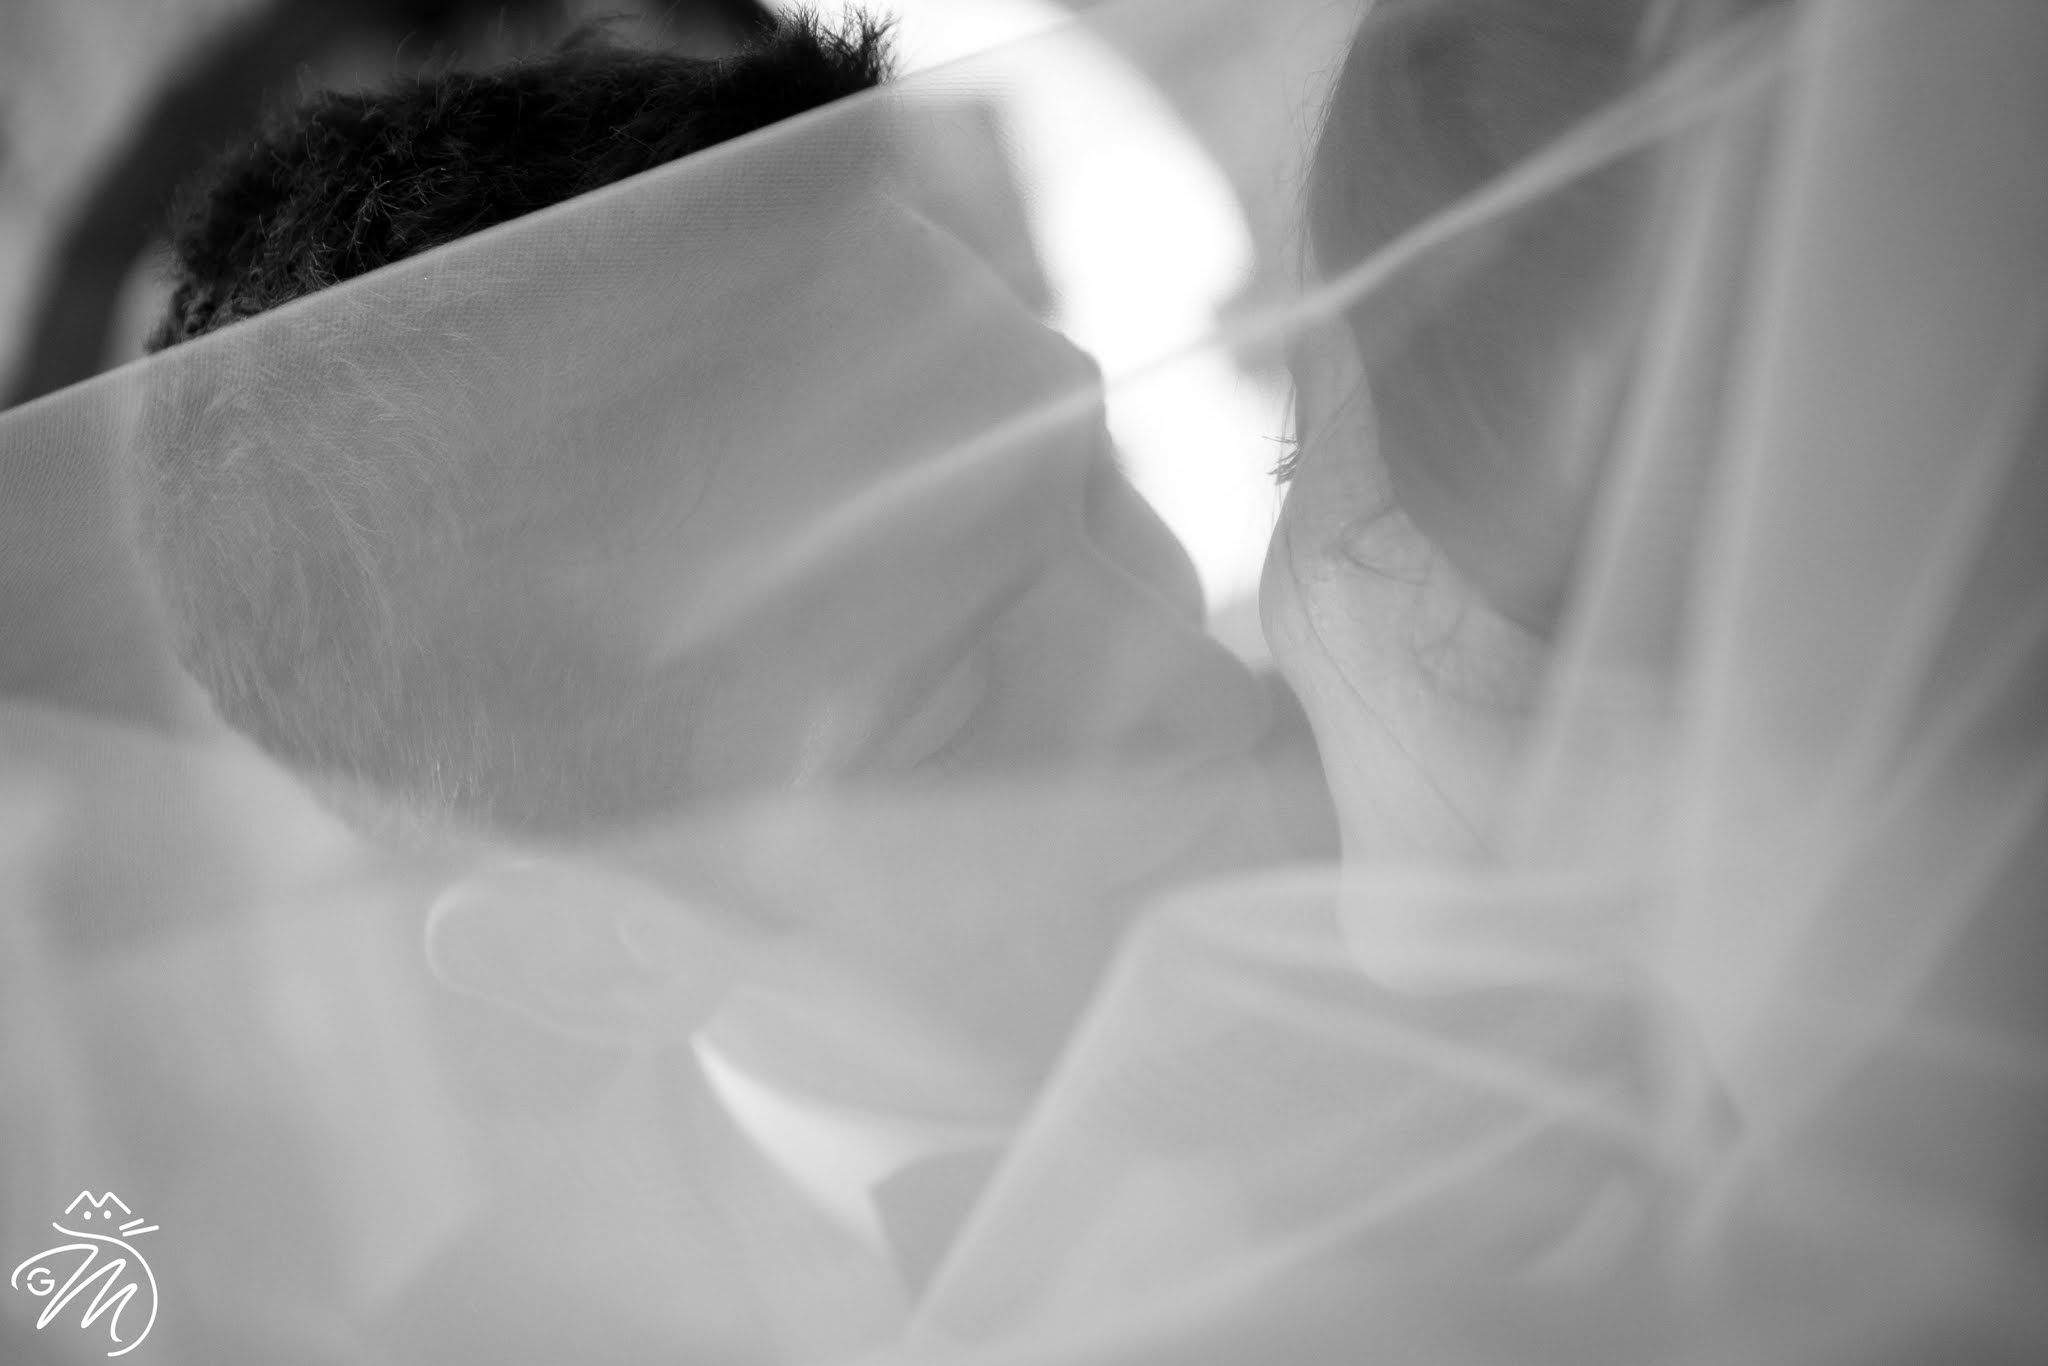 fotografo matrimonio Roma photographer in Italy ORIZZONTALI2_LOGO_HOME_PAGE_INTERNATIONAL_PHOTOGRAPHER_IN_ROME_WEDDING_DESTINATION_GIROLAMO_MONTELEONE_-27